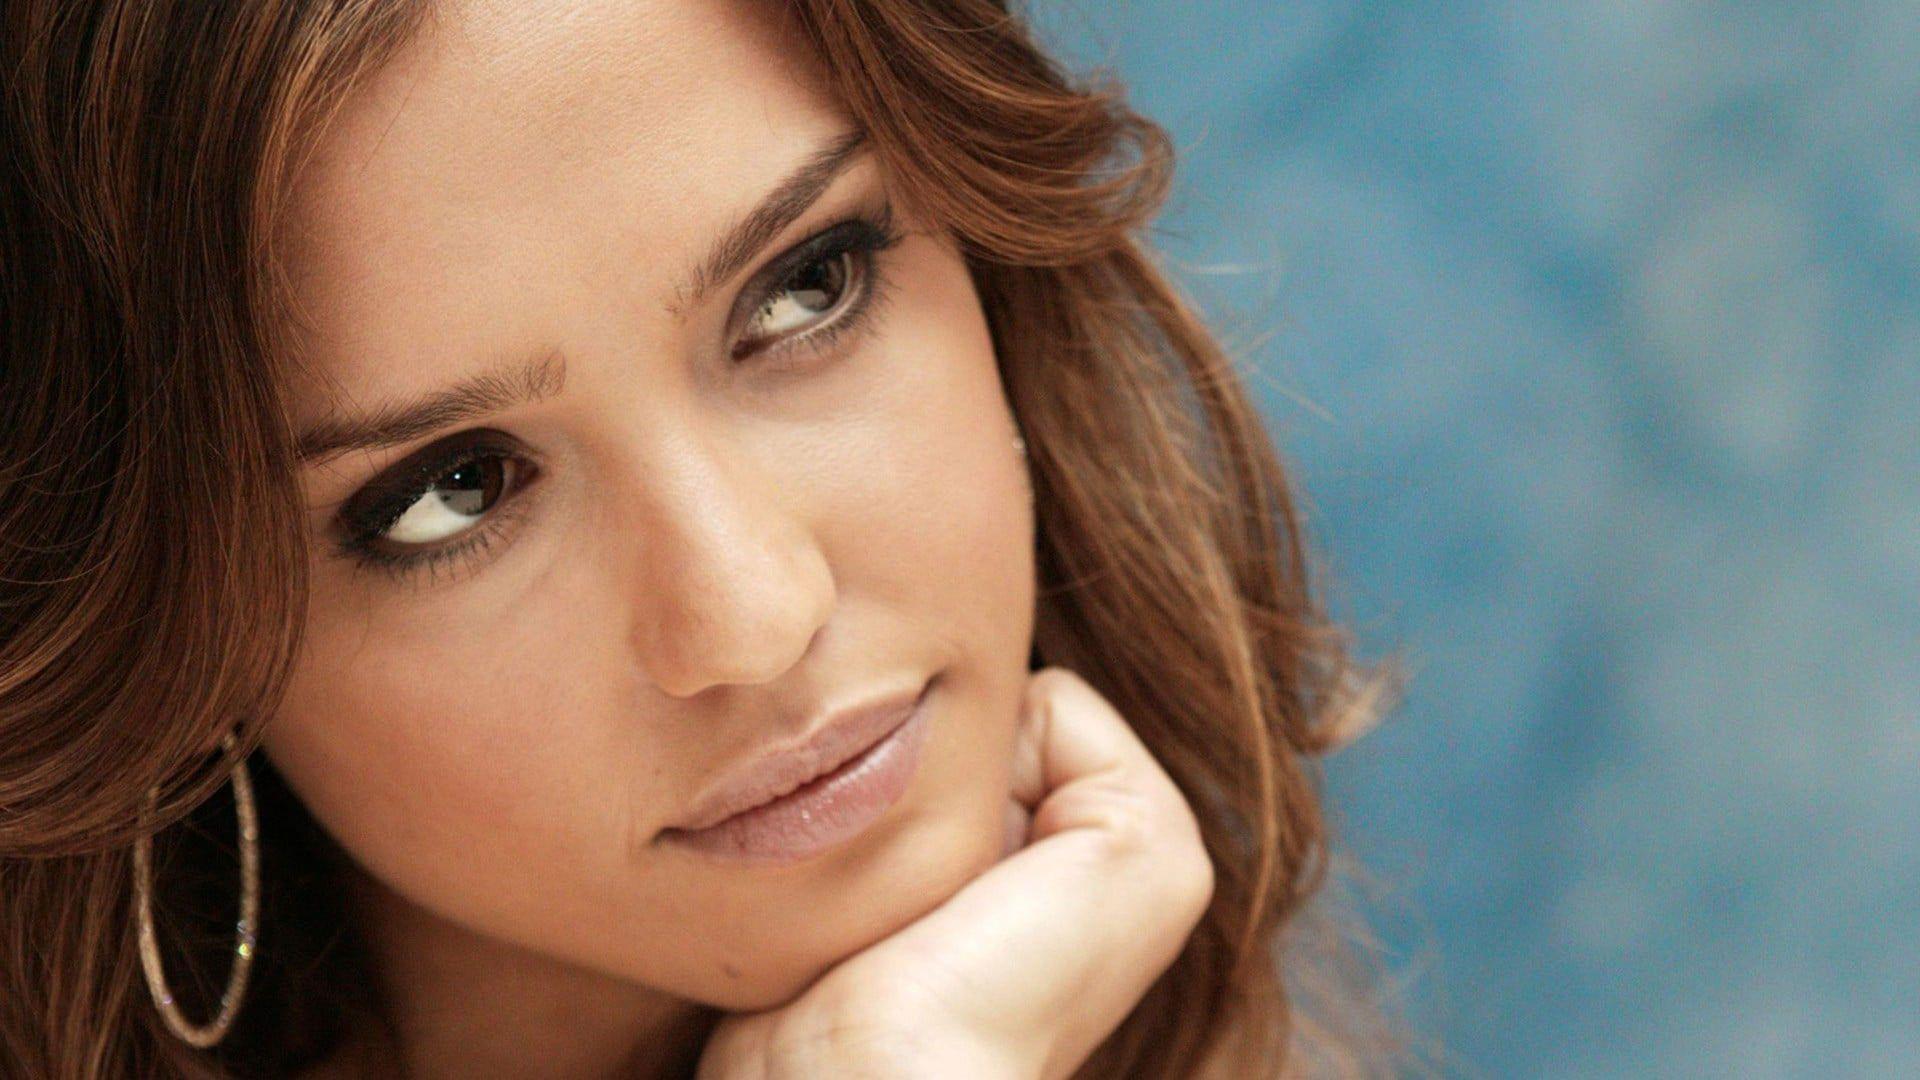 Hd pics photos stunning attractive jessica alba 17 hd - Jessica alba desktop wallpaper ...